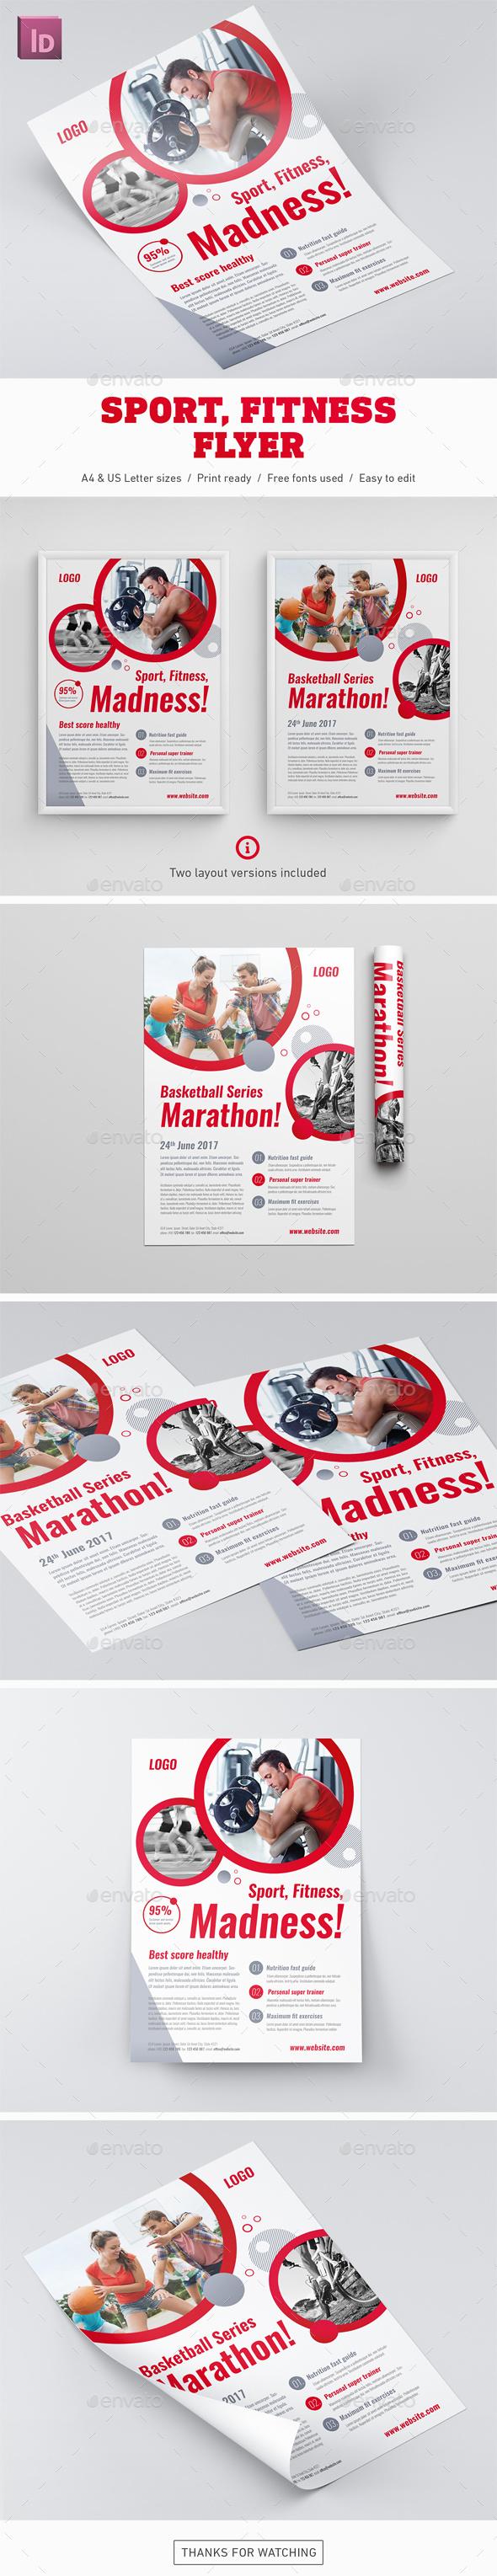 Sport Fitness Flyer - Corporate Flyers